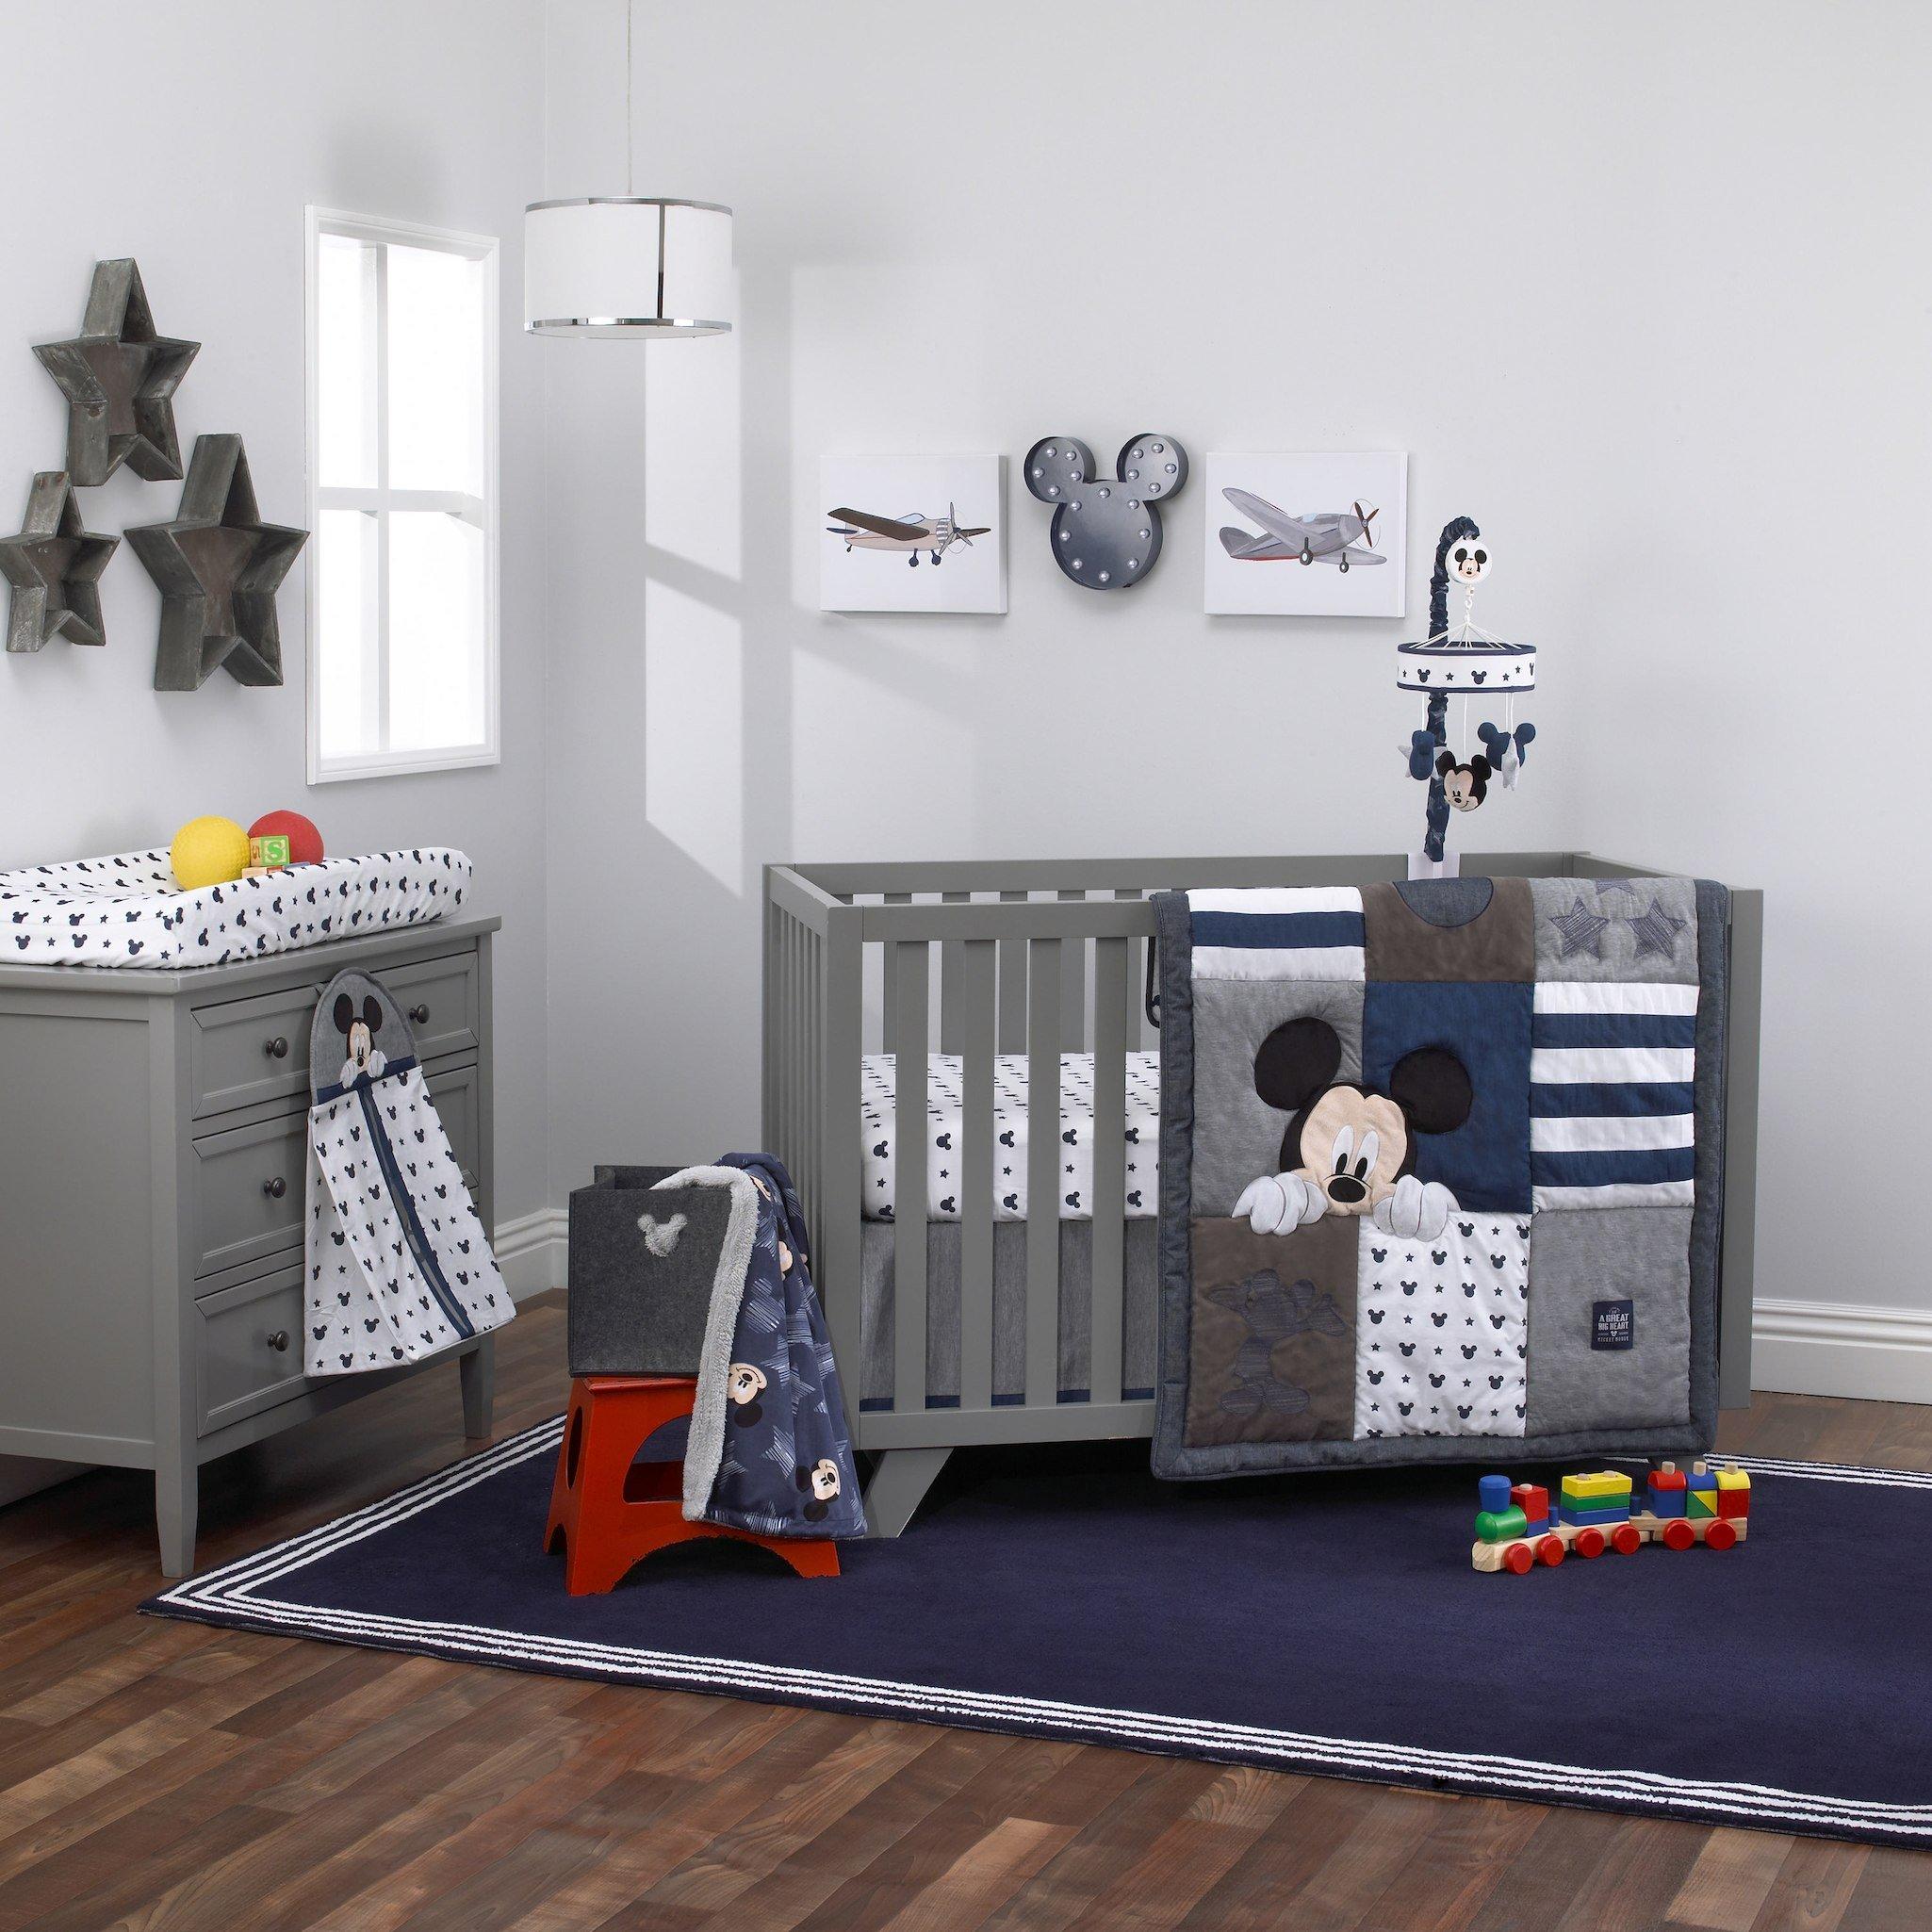 Disney Baby Mickey Mouse ''Hello World'' 4 Piece Crib Bedding Set - Navy Denim & White